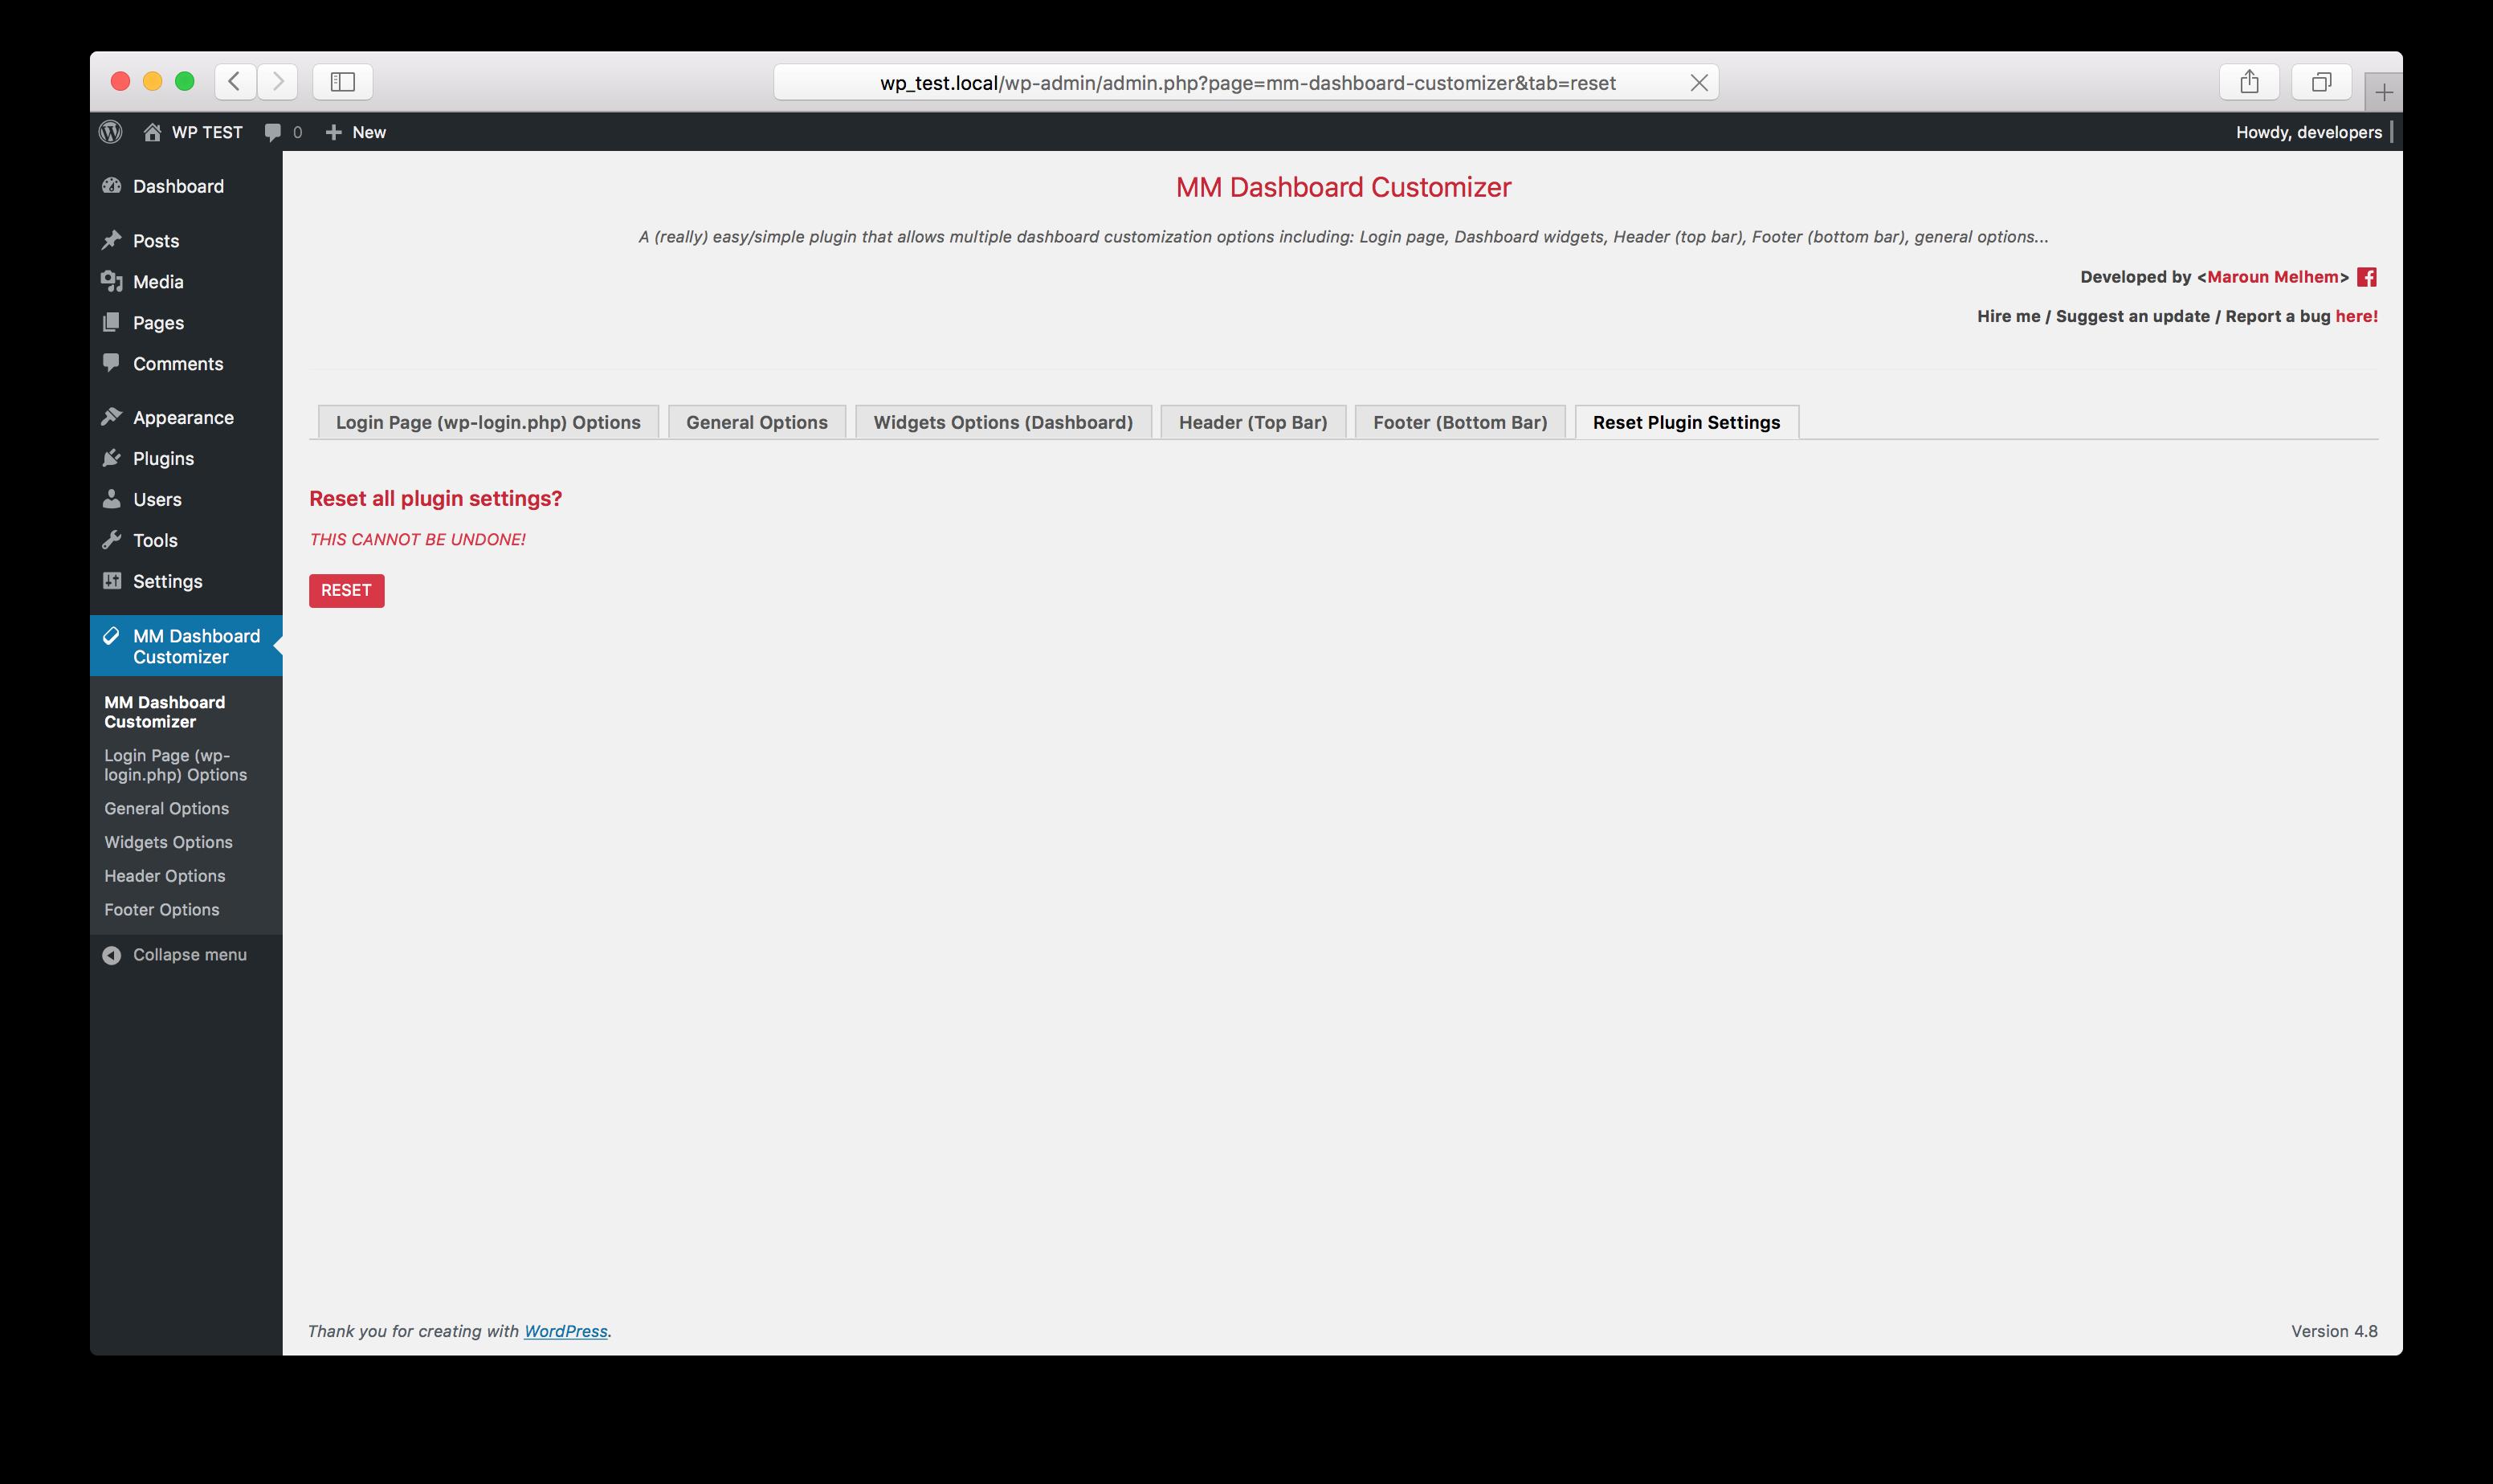 Plugin reset settings options